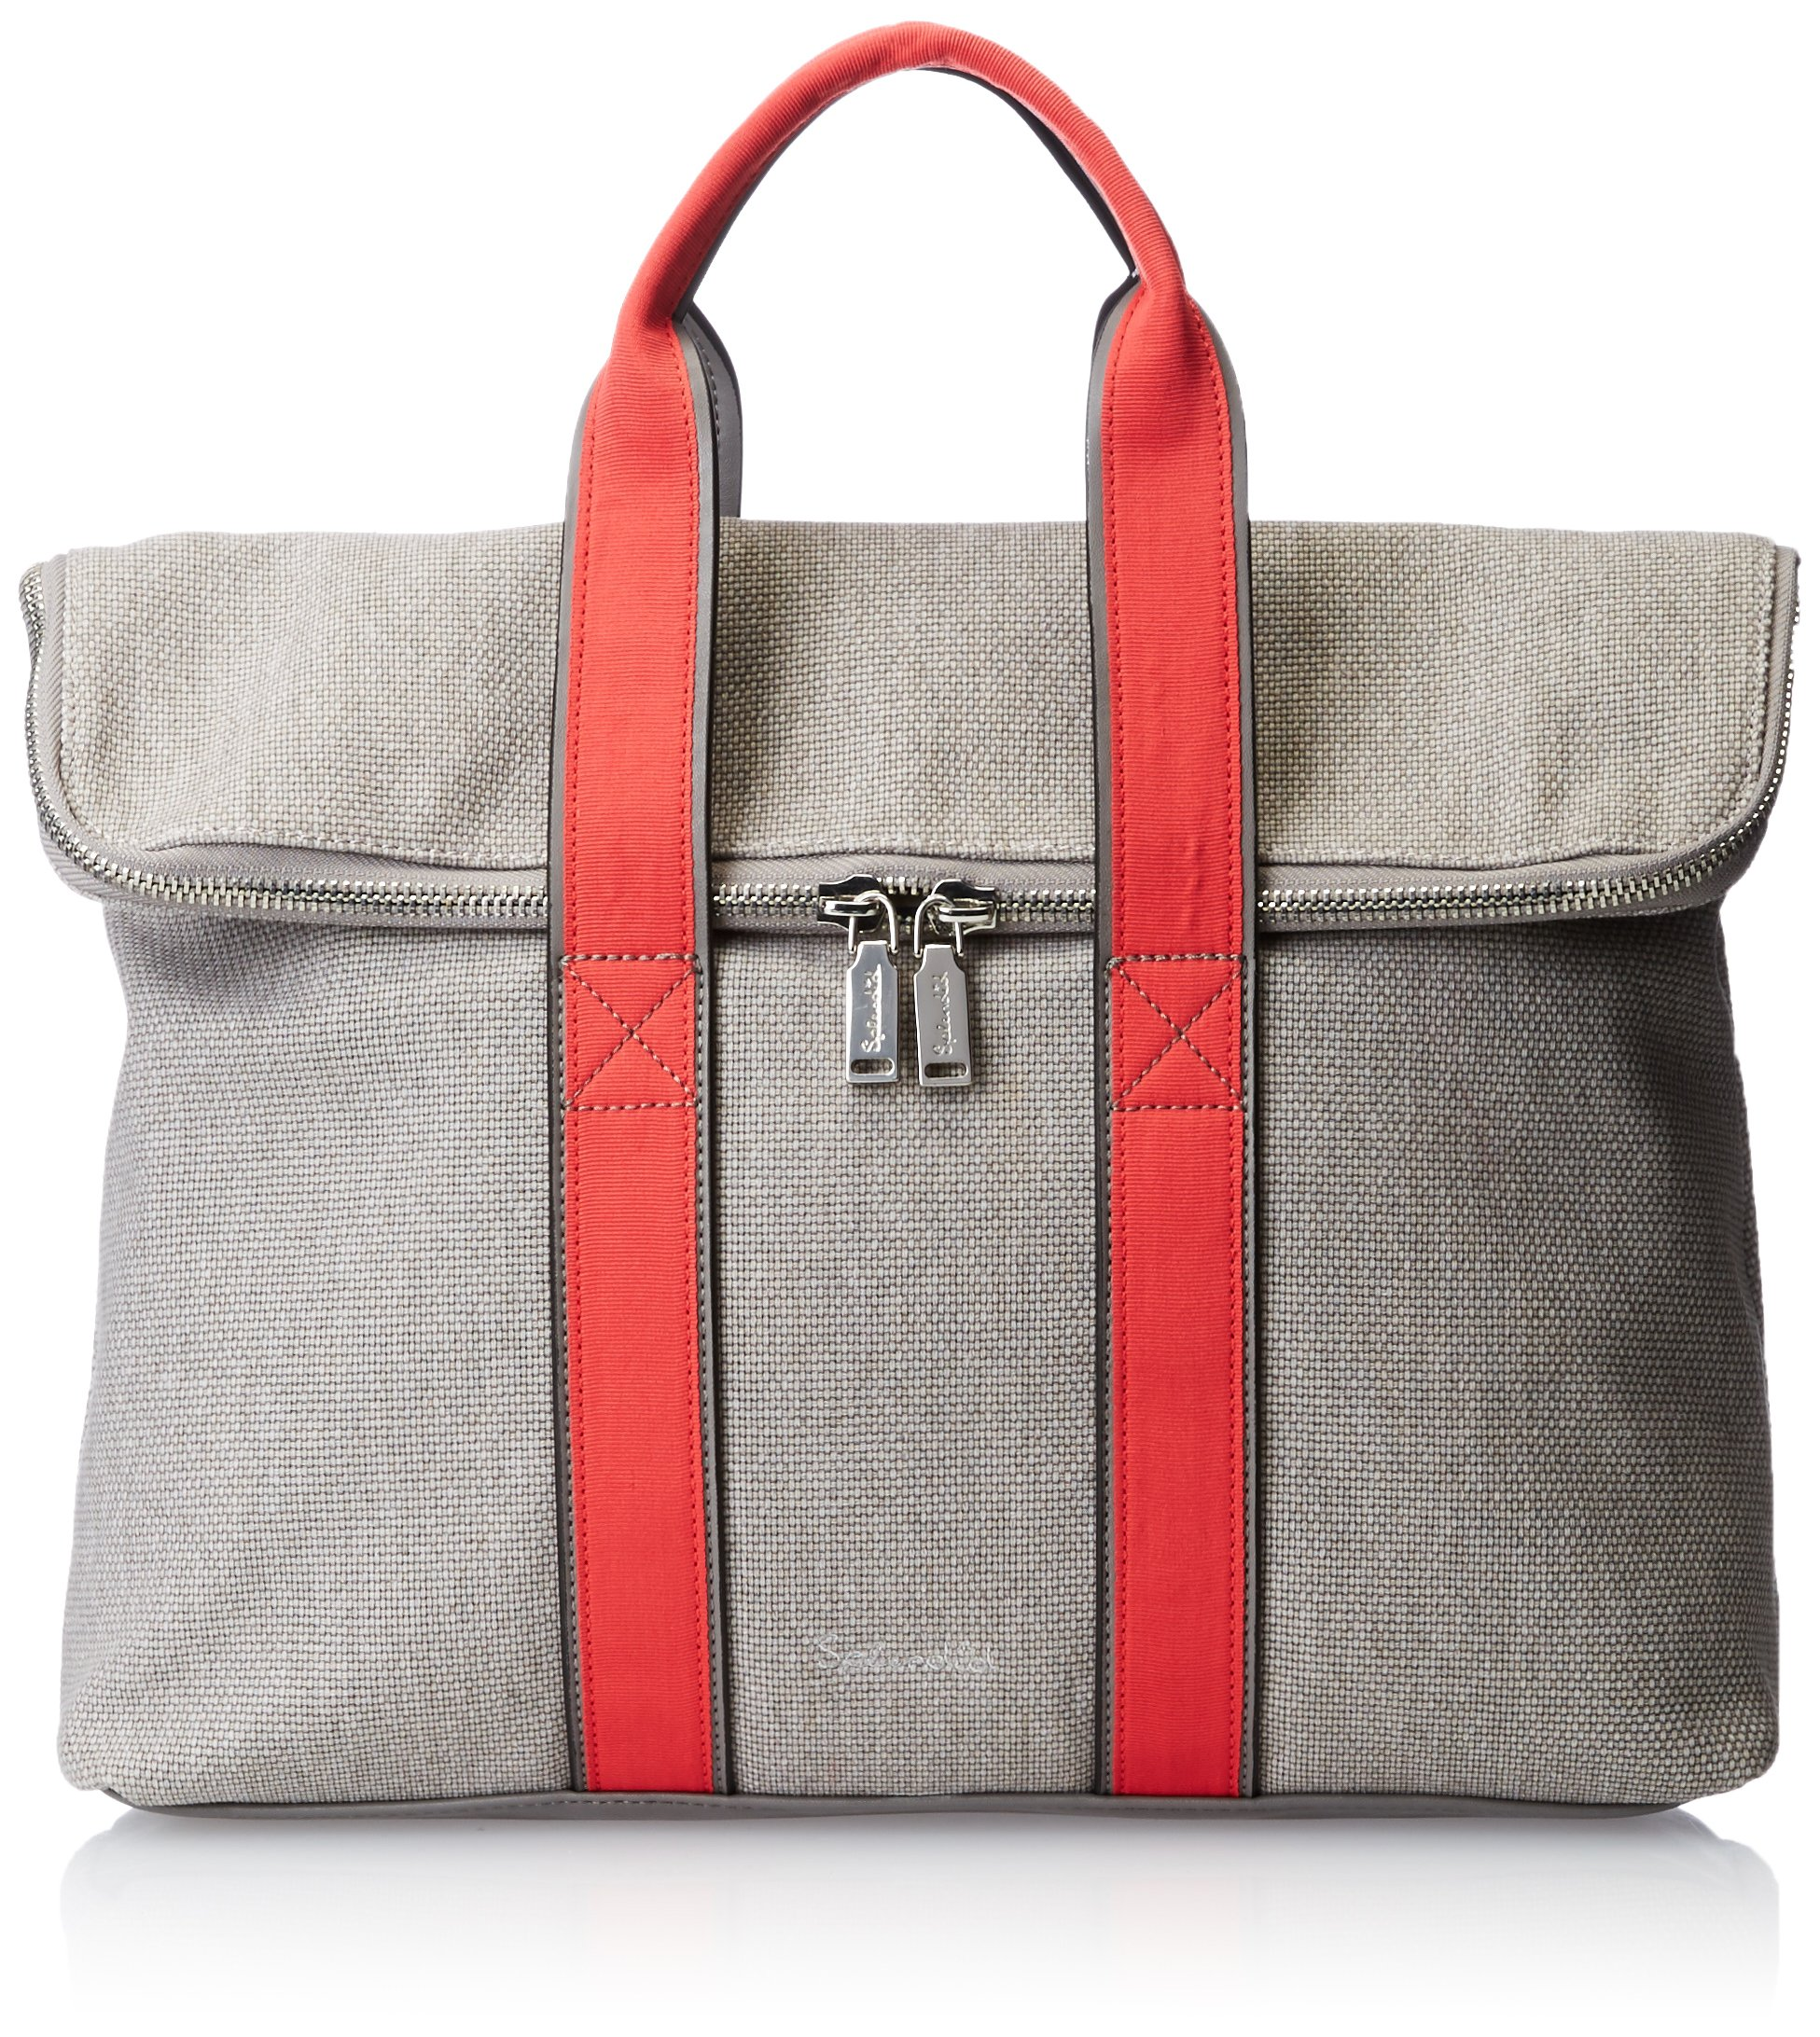 Splendid Cape May Satchel Top Handle Bag, Grey, One Size by Splendid (Image #1)